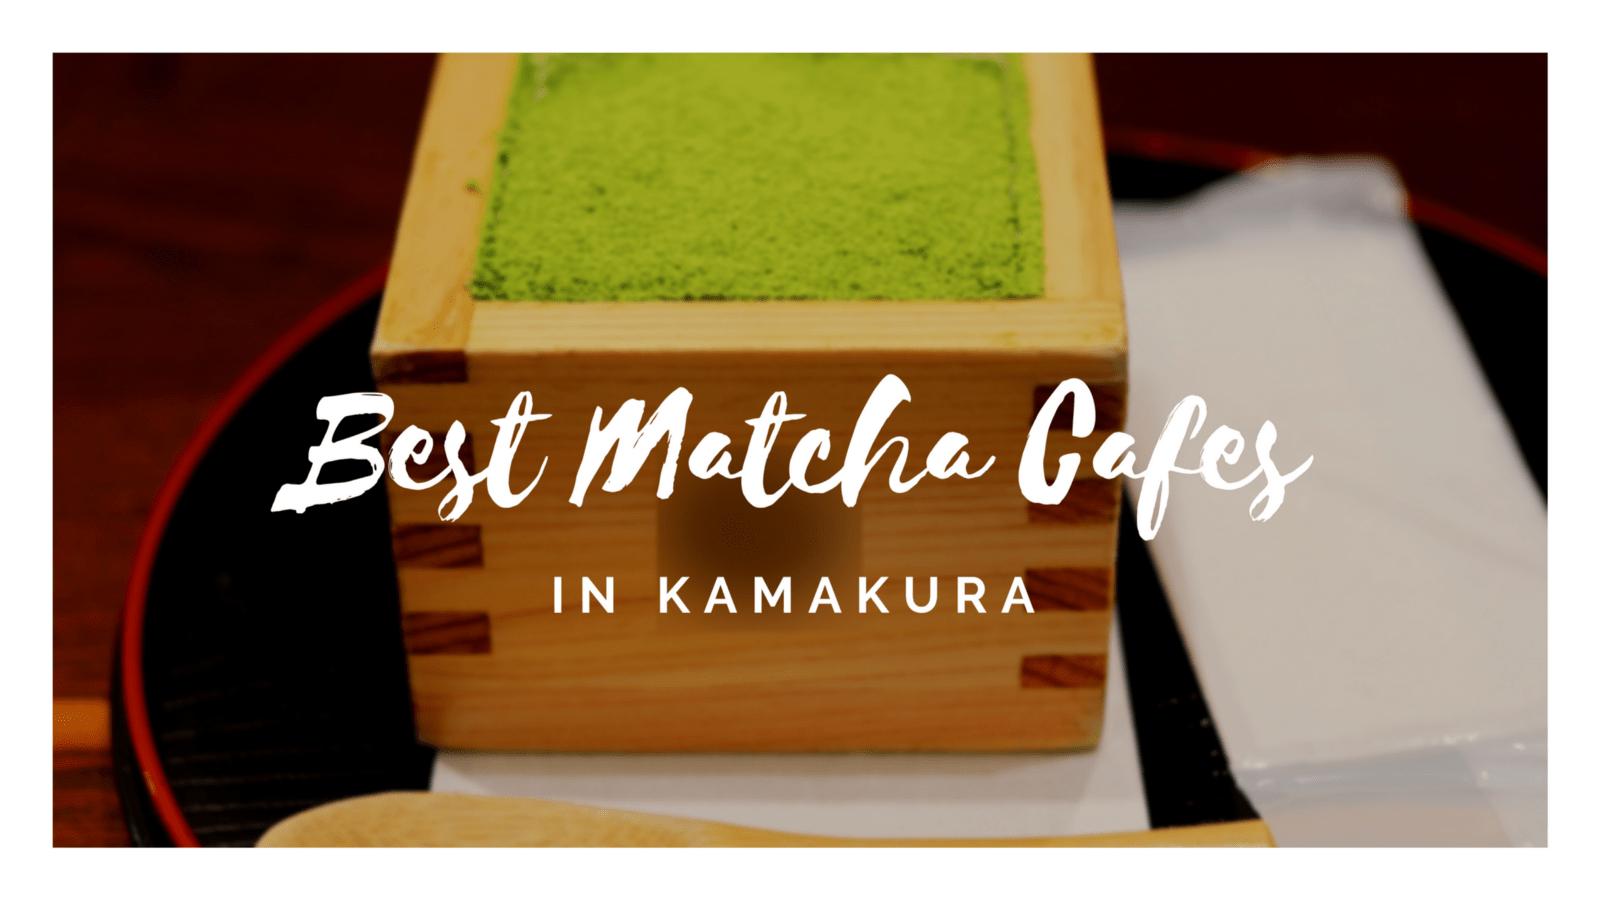 5 Best Cafes in Kamakura 2020